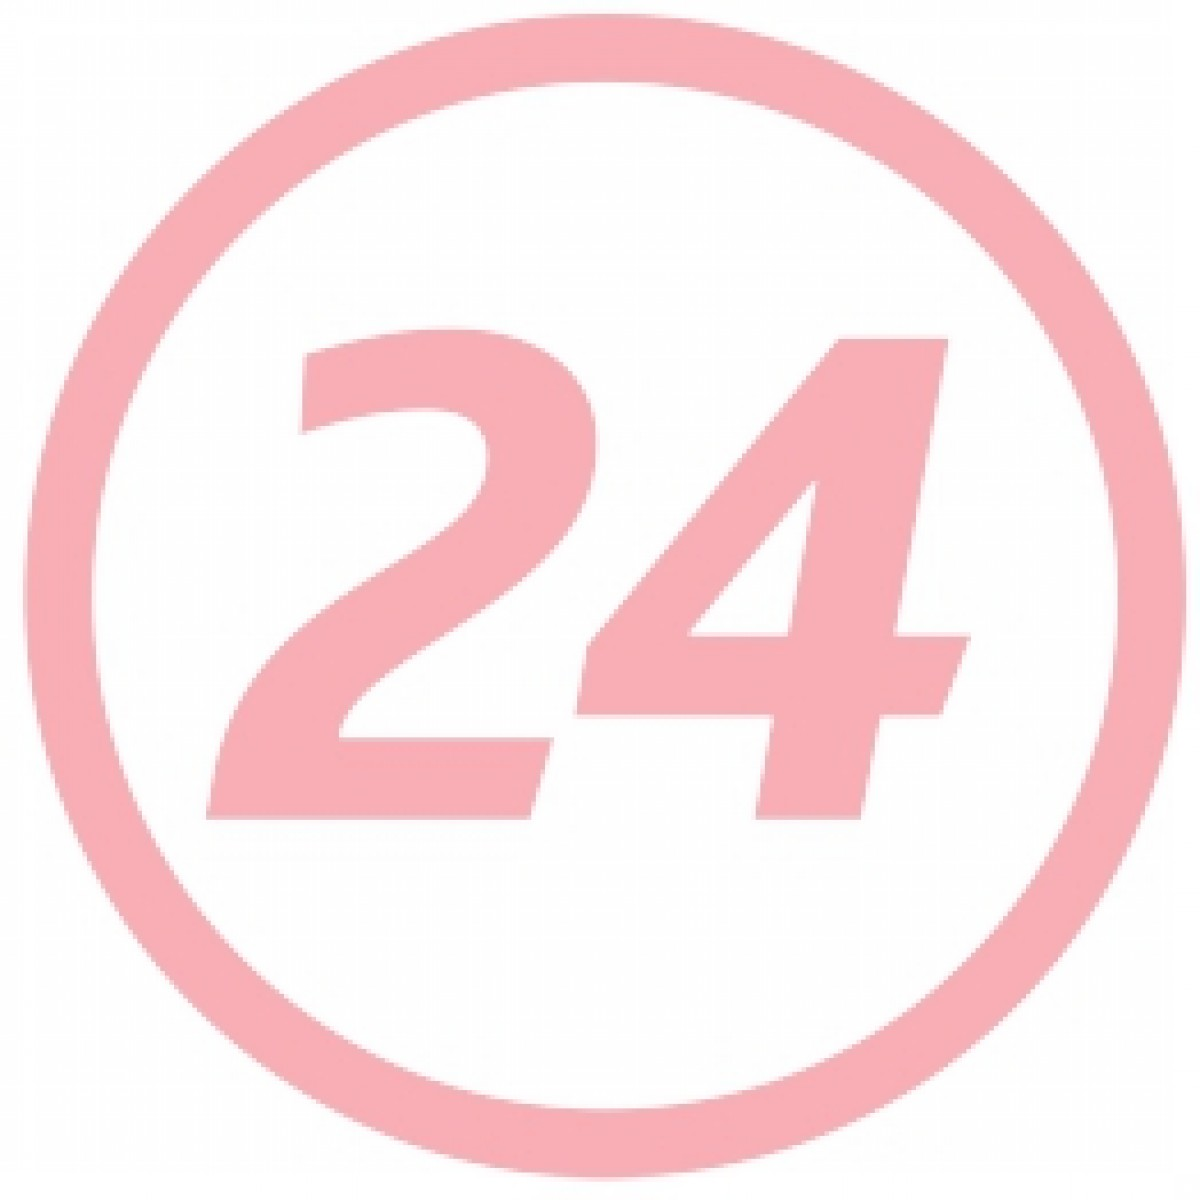 VEET Ceara Epilatoare Rece Benzi pt Piele Normala cu Unt de Shea, Benzi, 12buc